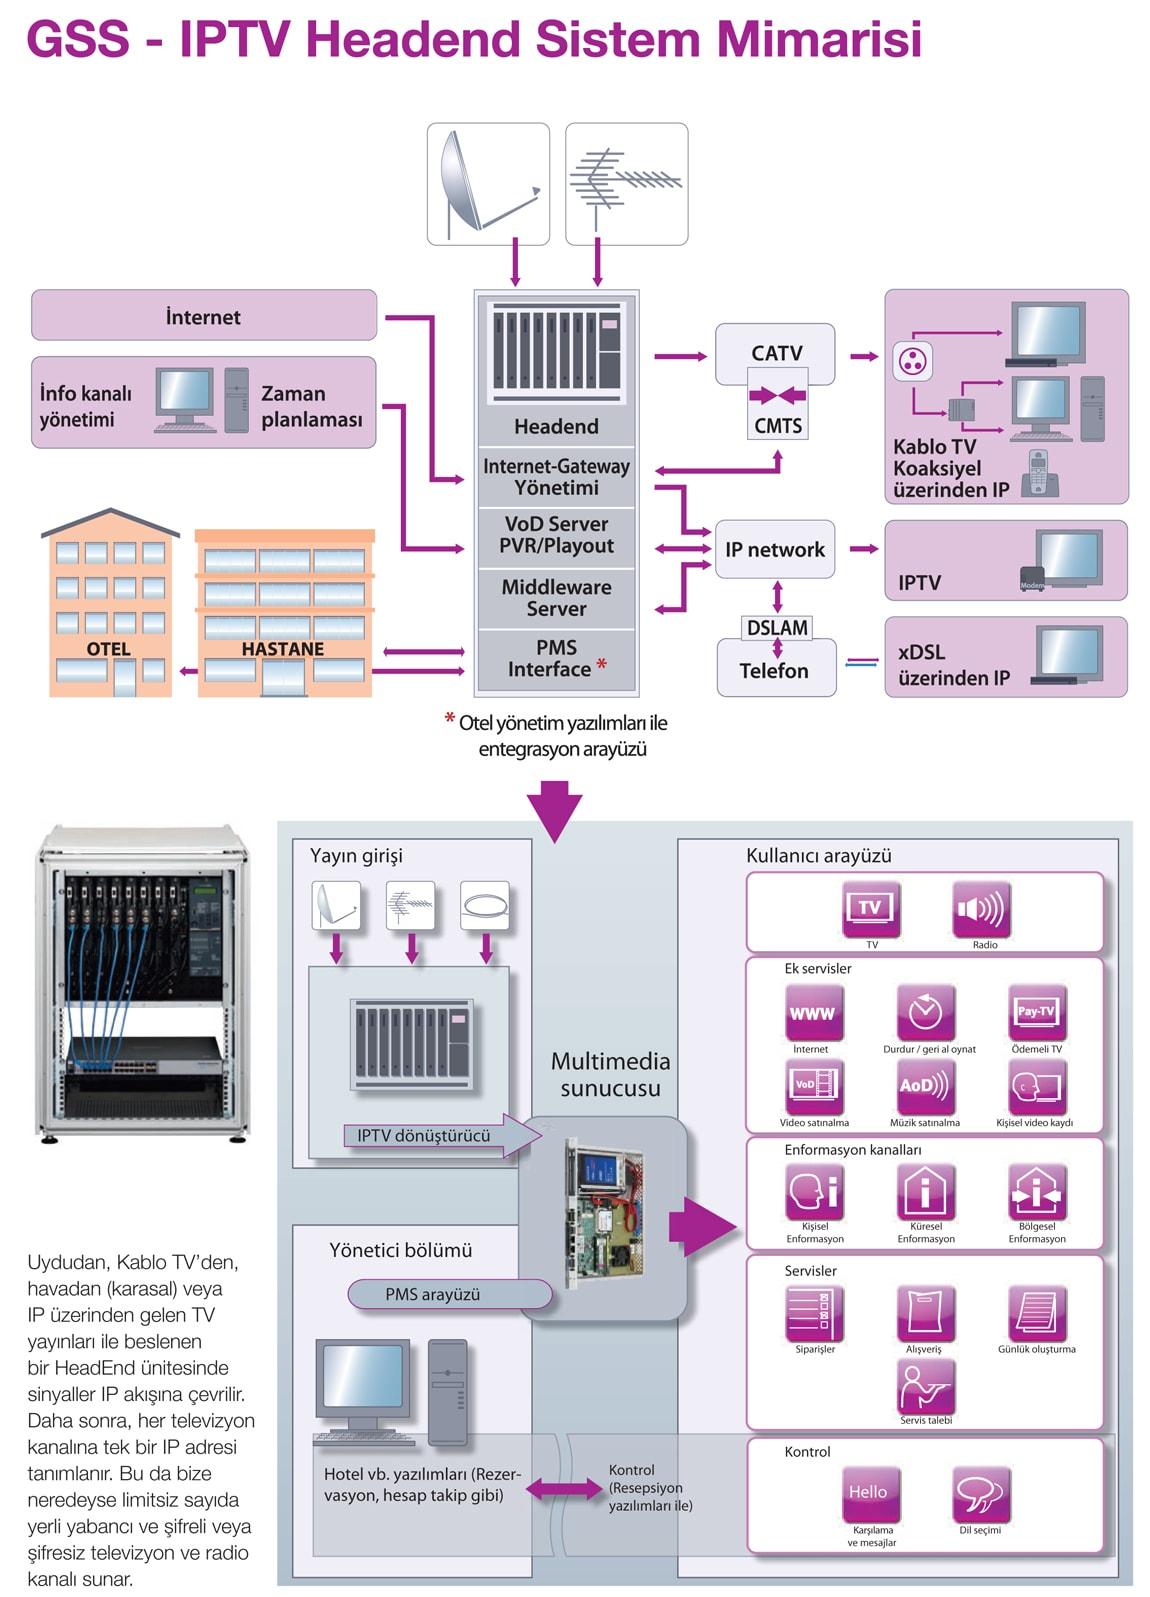 GSS---IPTV-Headend-Sistem-Mimarisi